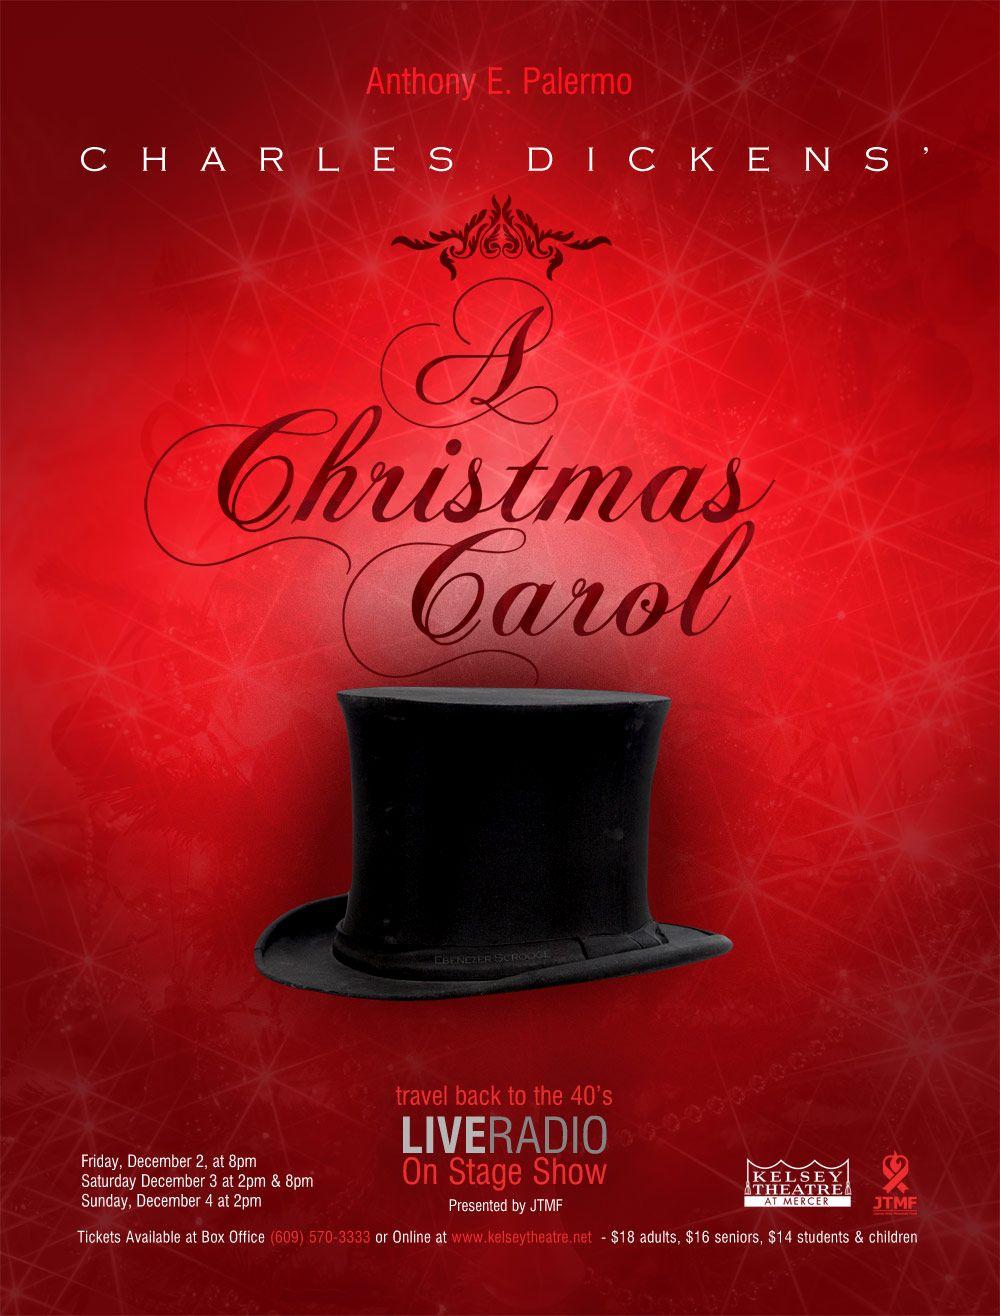 A Christmas Carol Poster.Minimalist A Christmas Carol Poster Design Dickens